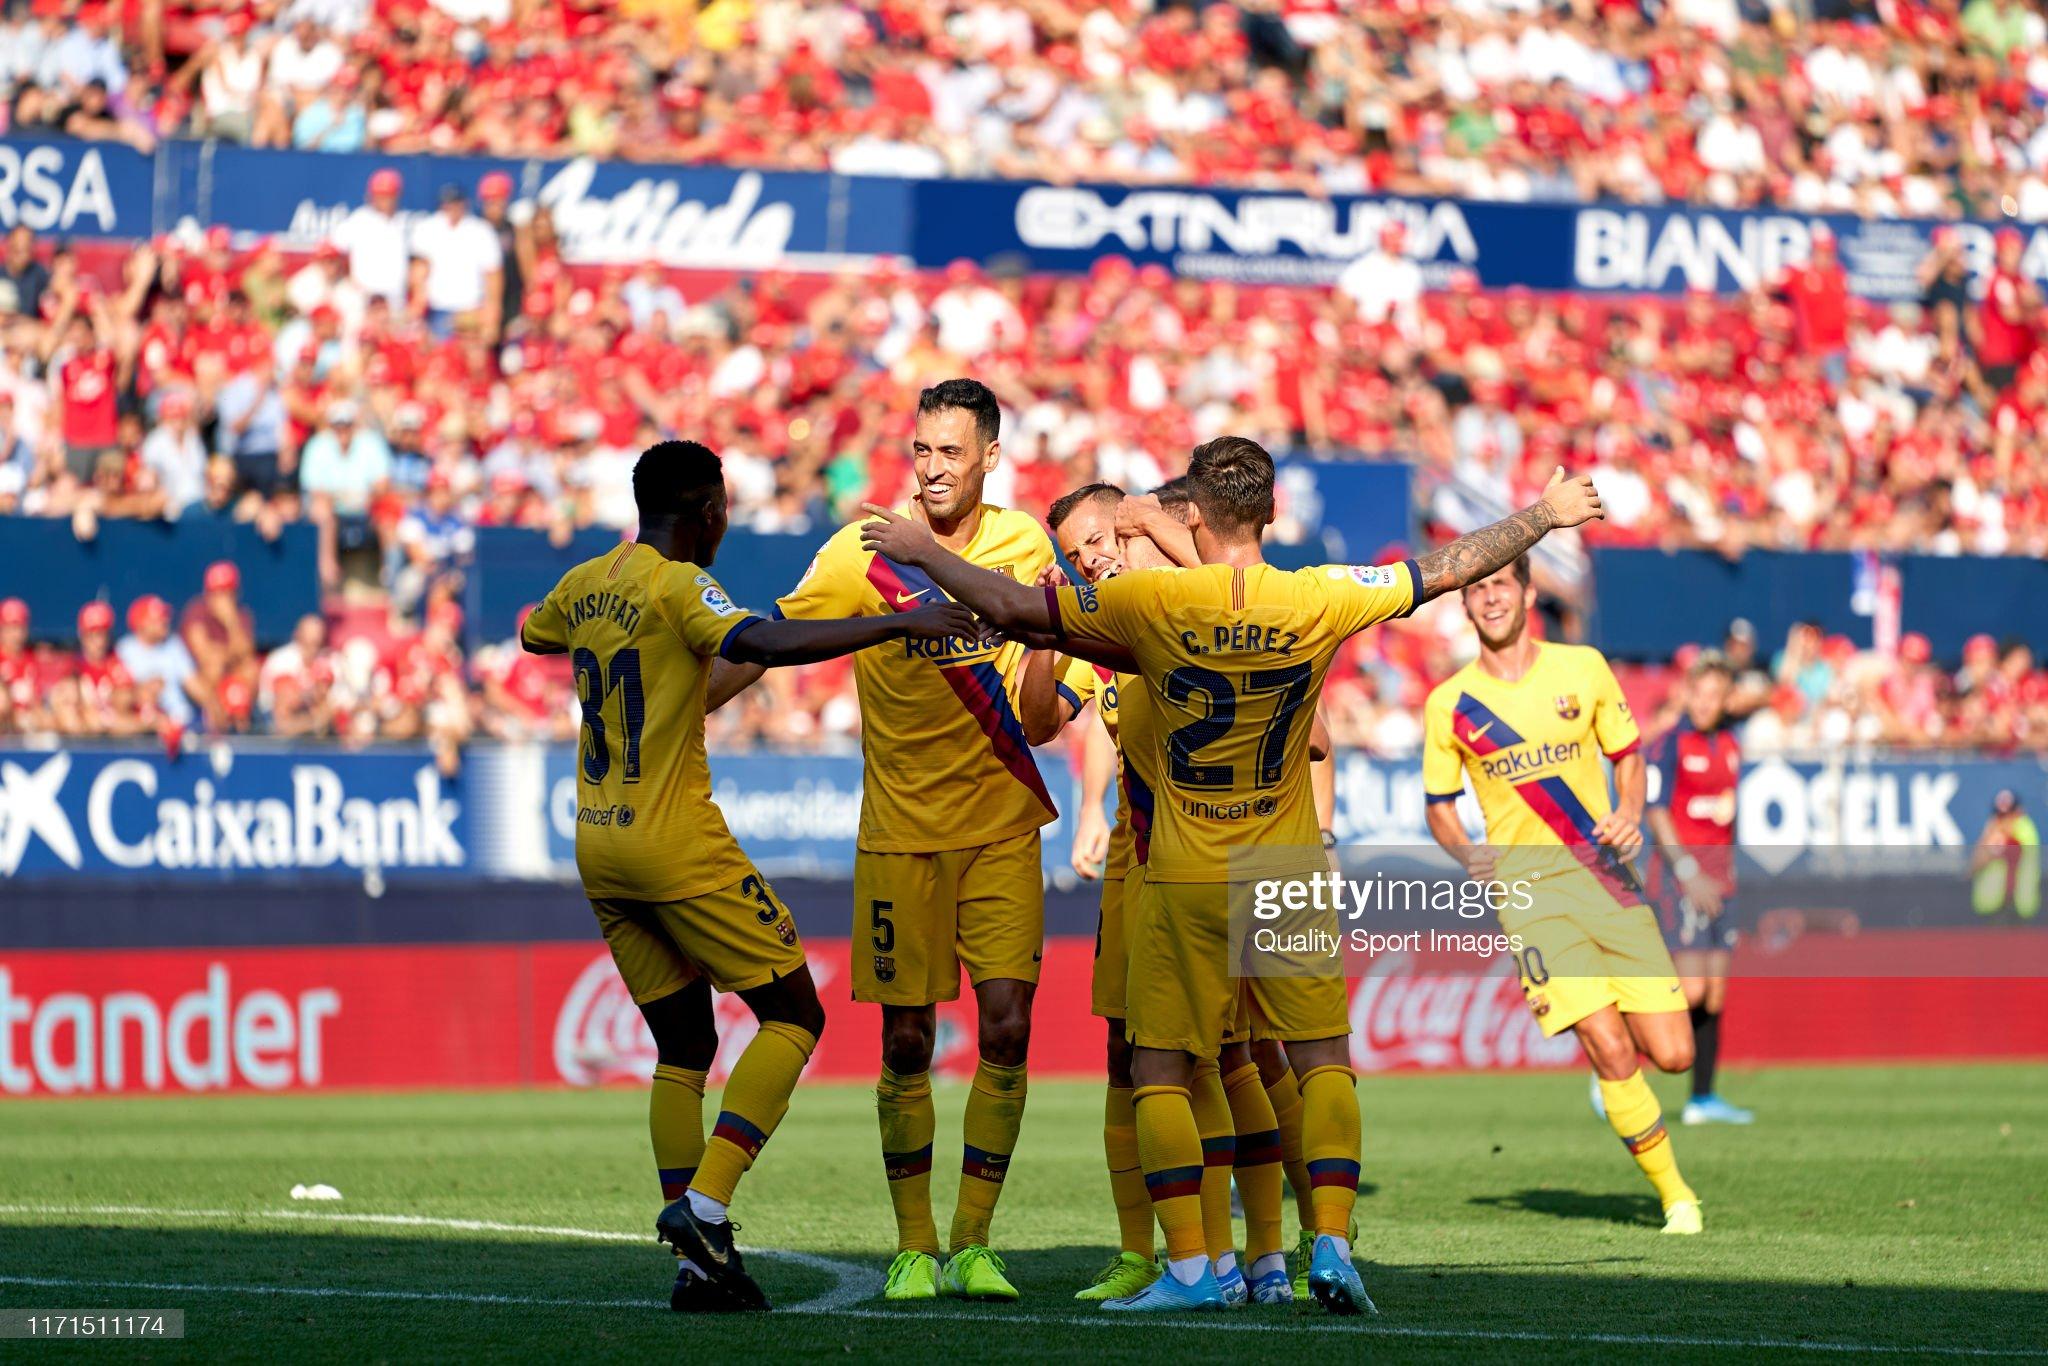 صور مباراة : أوساسونا - برشلونة 2-2 ( 31-08-2019 )  Players-of-fc-barcelona-celebrating-their-teams-second-goal-during-picture-id1171511174?s=2048x2048